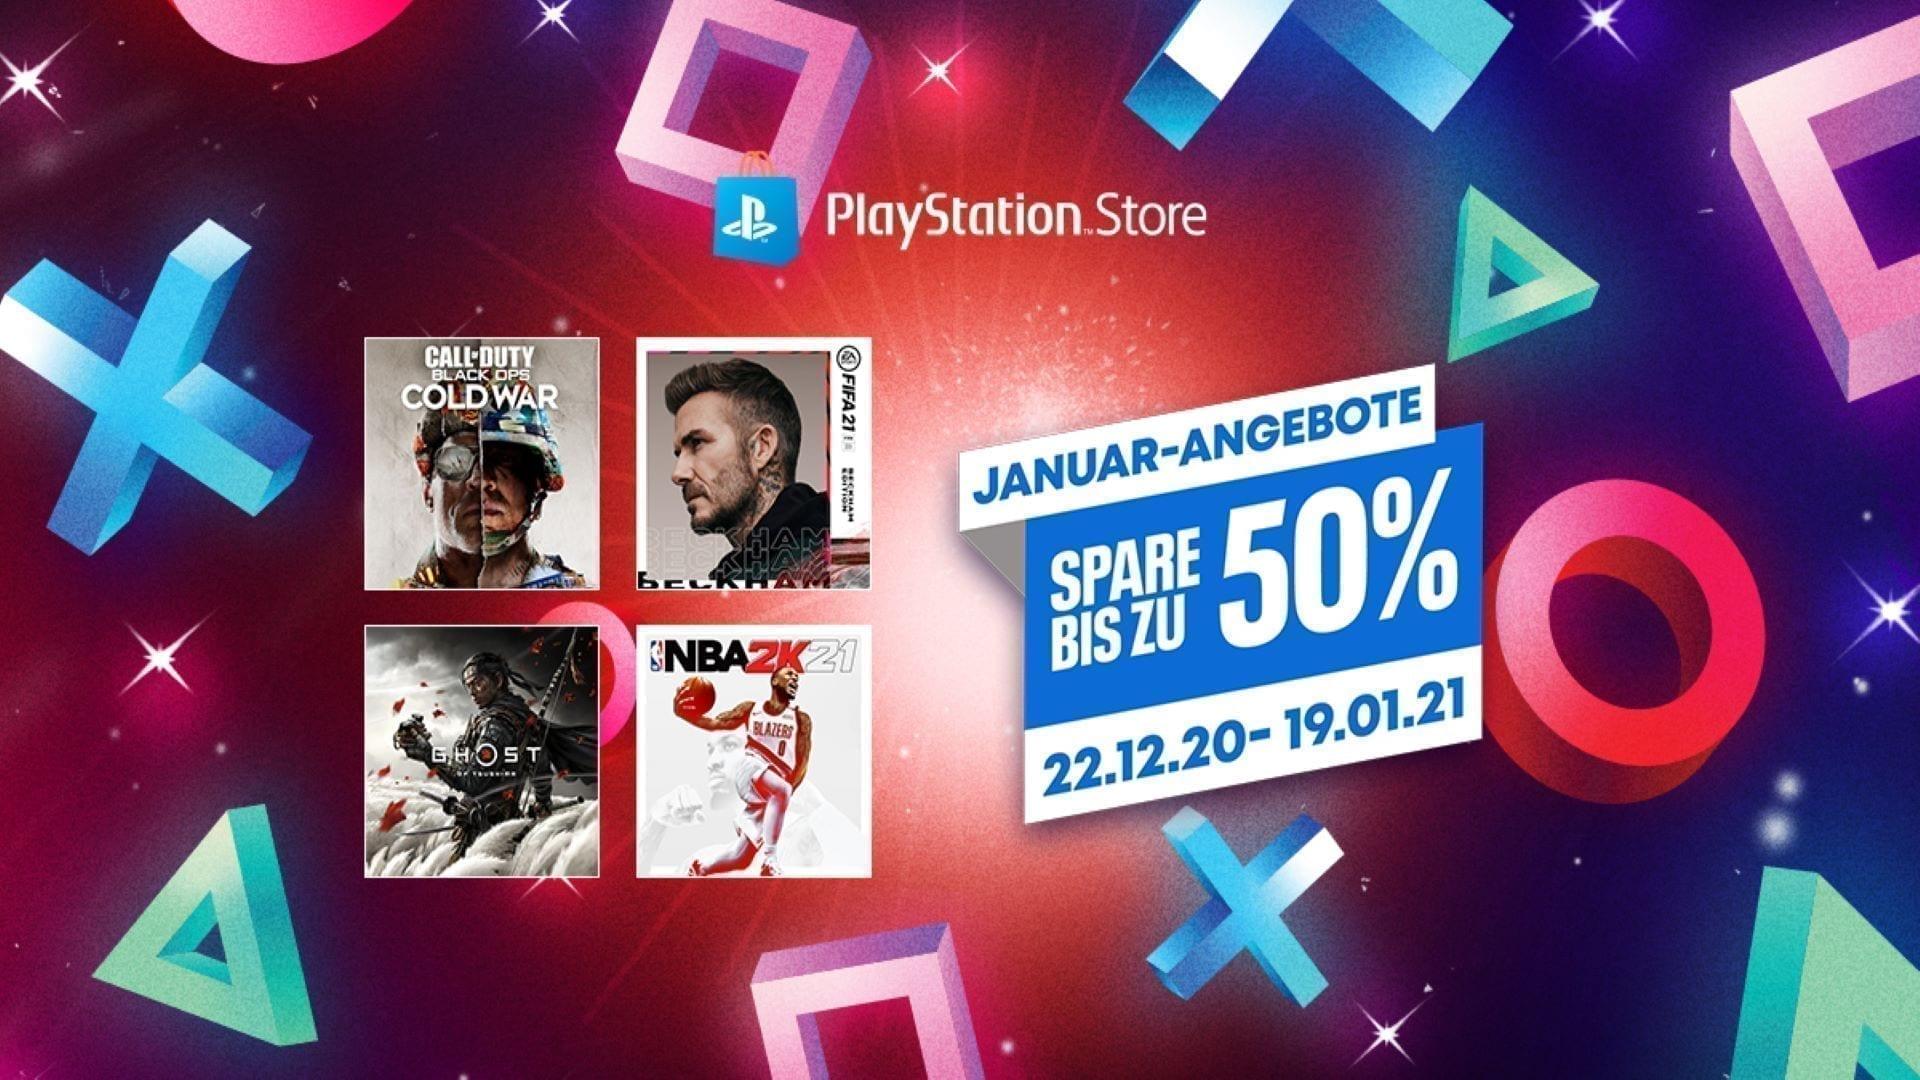 PlayStation Store Angebote im Januar 2021